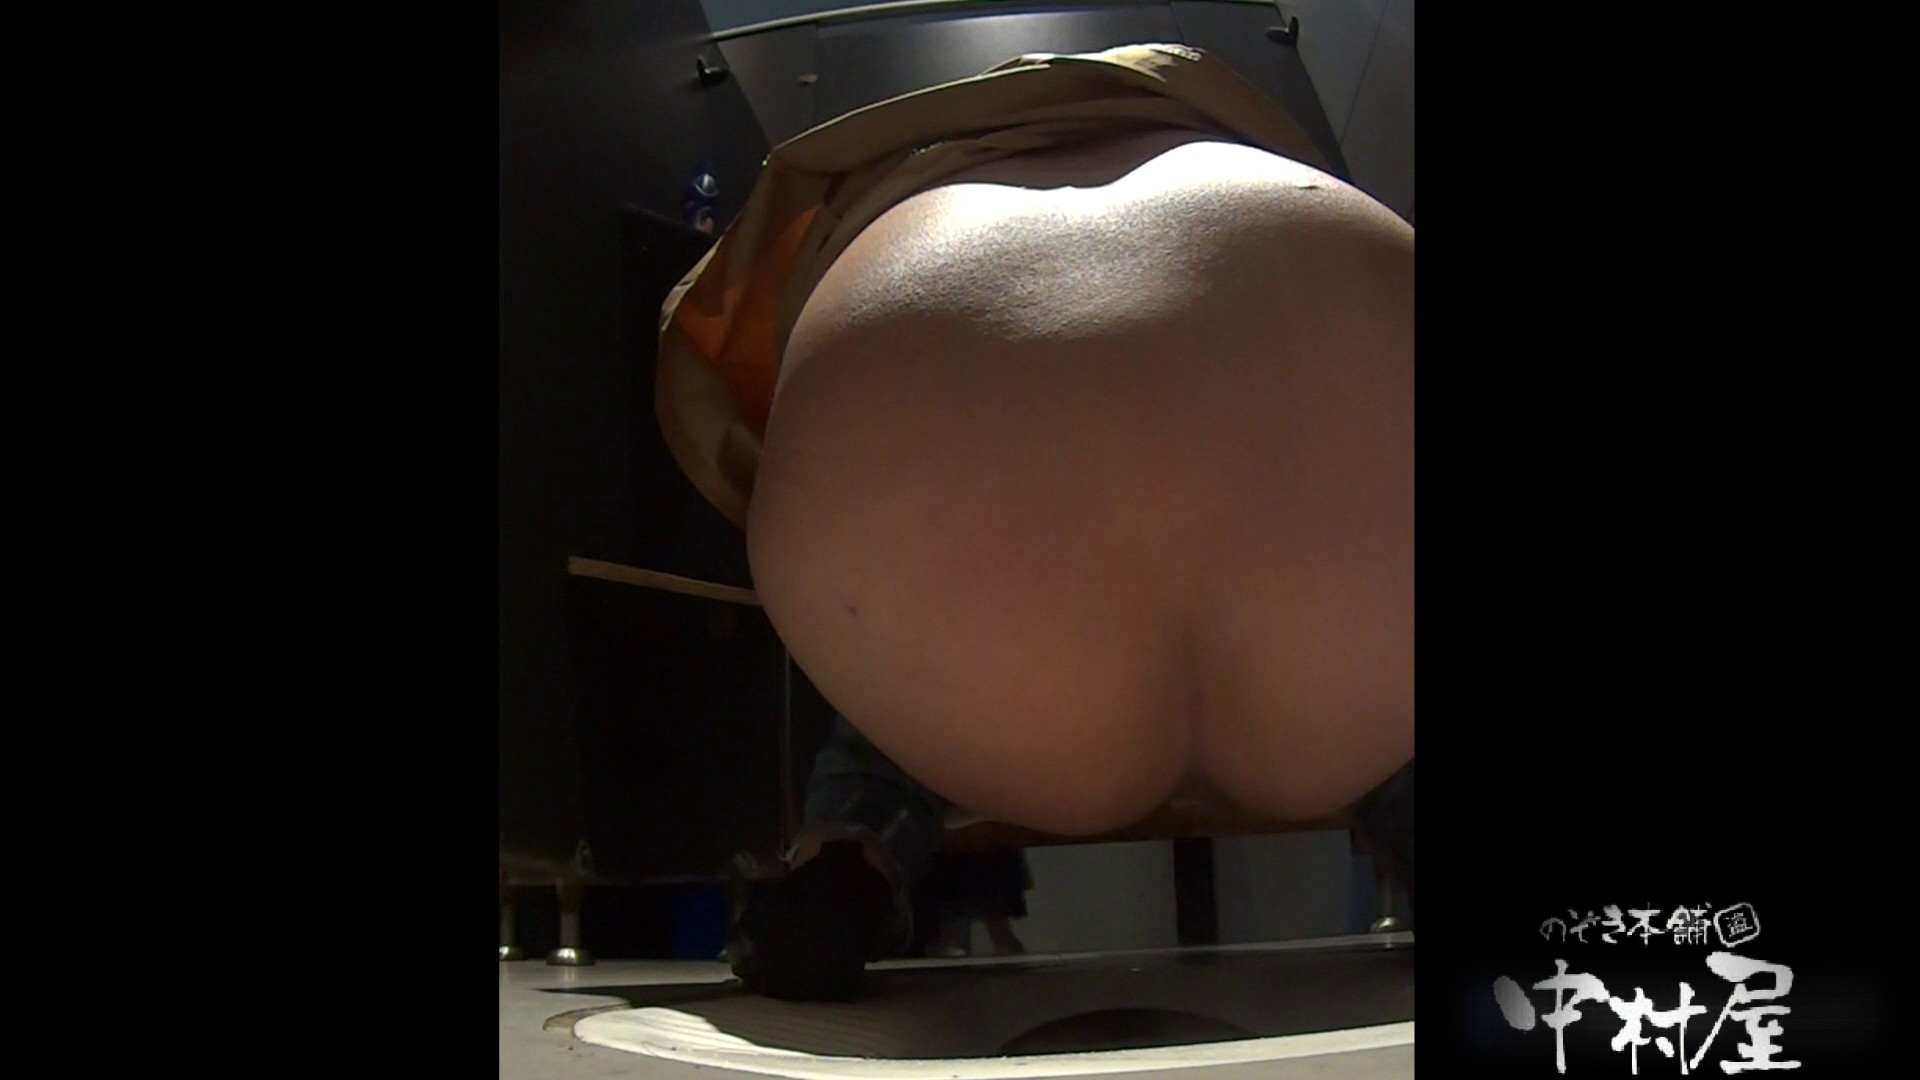 大学休憩時間の洗面所事情22 美女ハメ撮り  81Pix 3